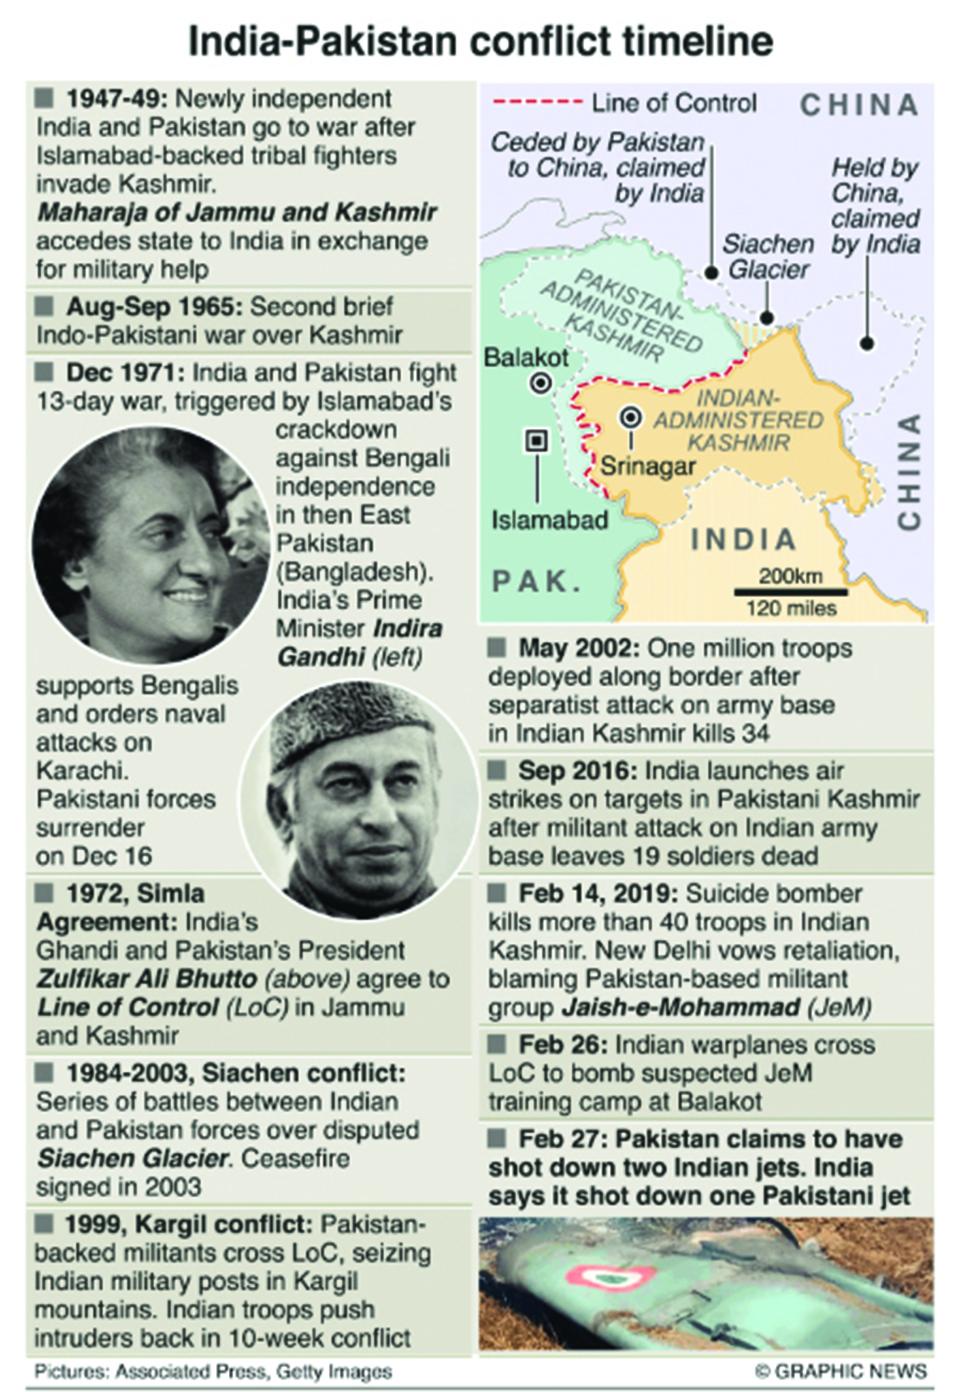 Infographic: India-Pakistan conflict timeline